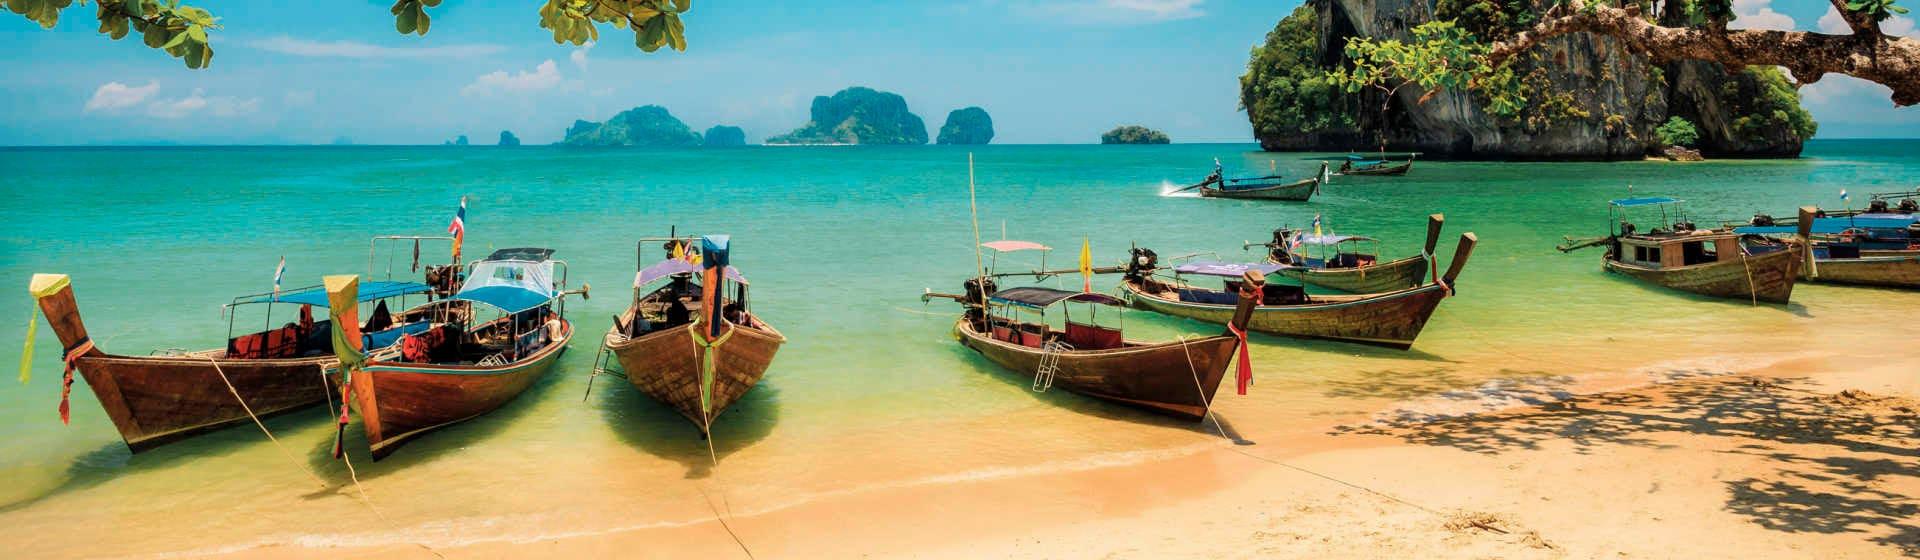 Таиланд - Мерч и одежда с атрибутикой